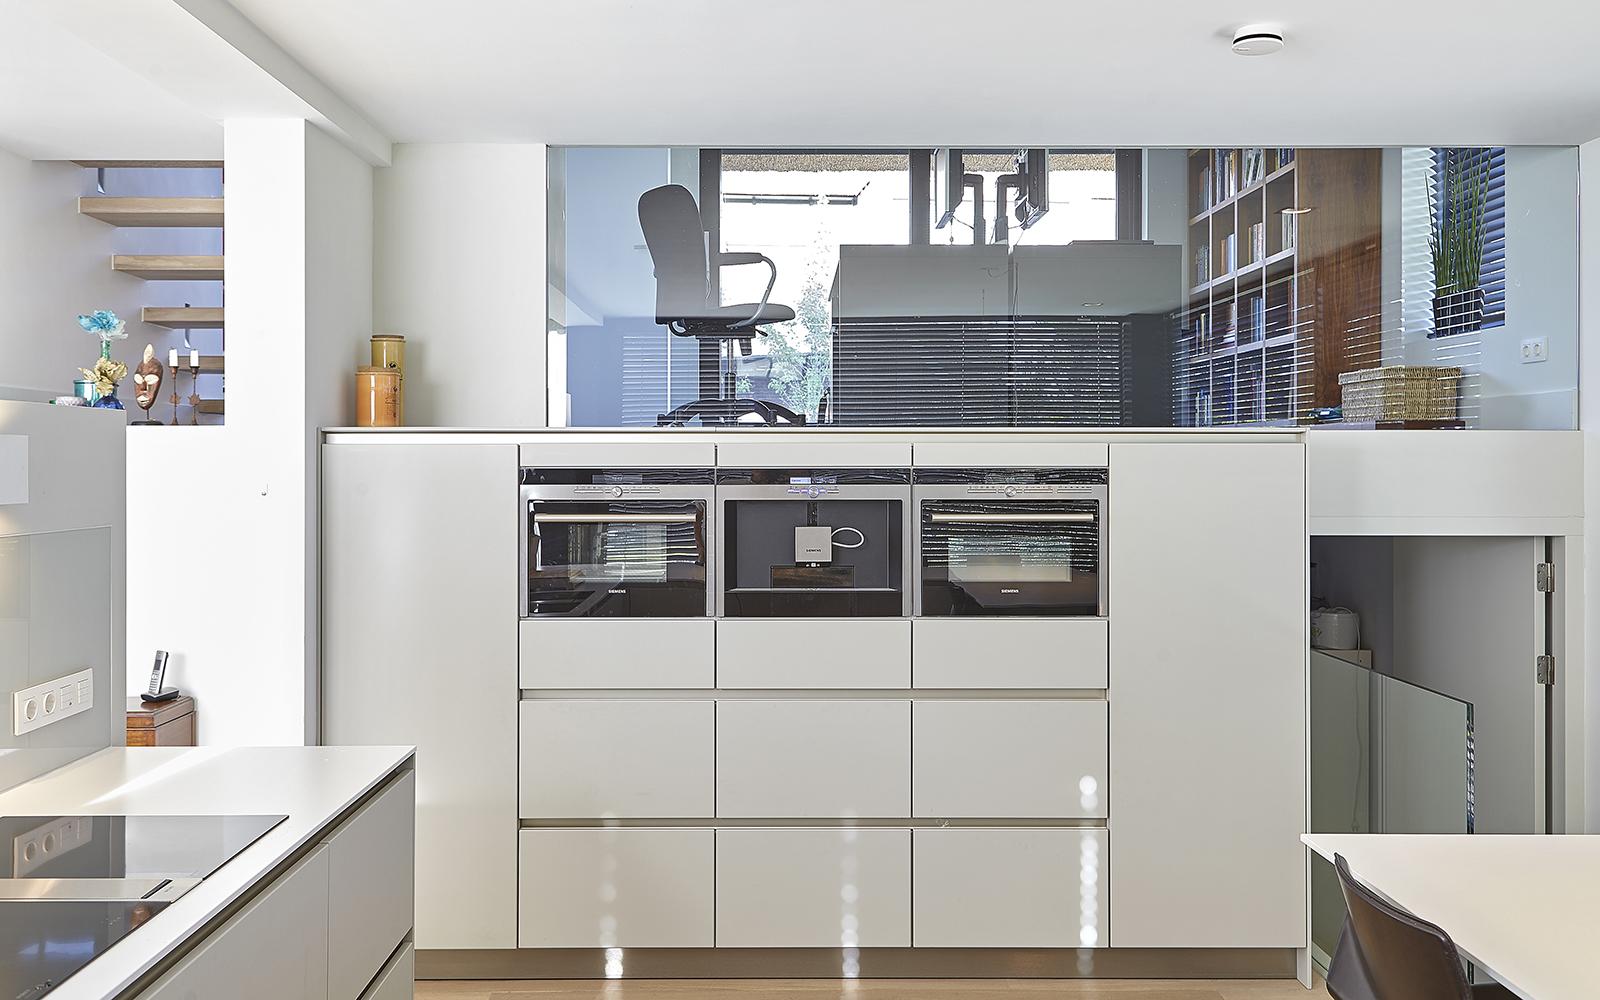 Keuken, Bob Manders, Van Wanrooij Warenhuys, Siemens